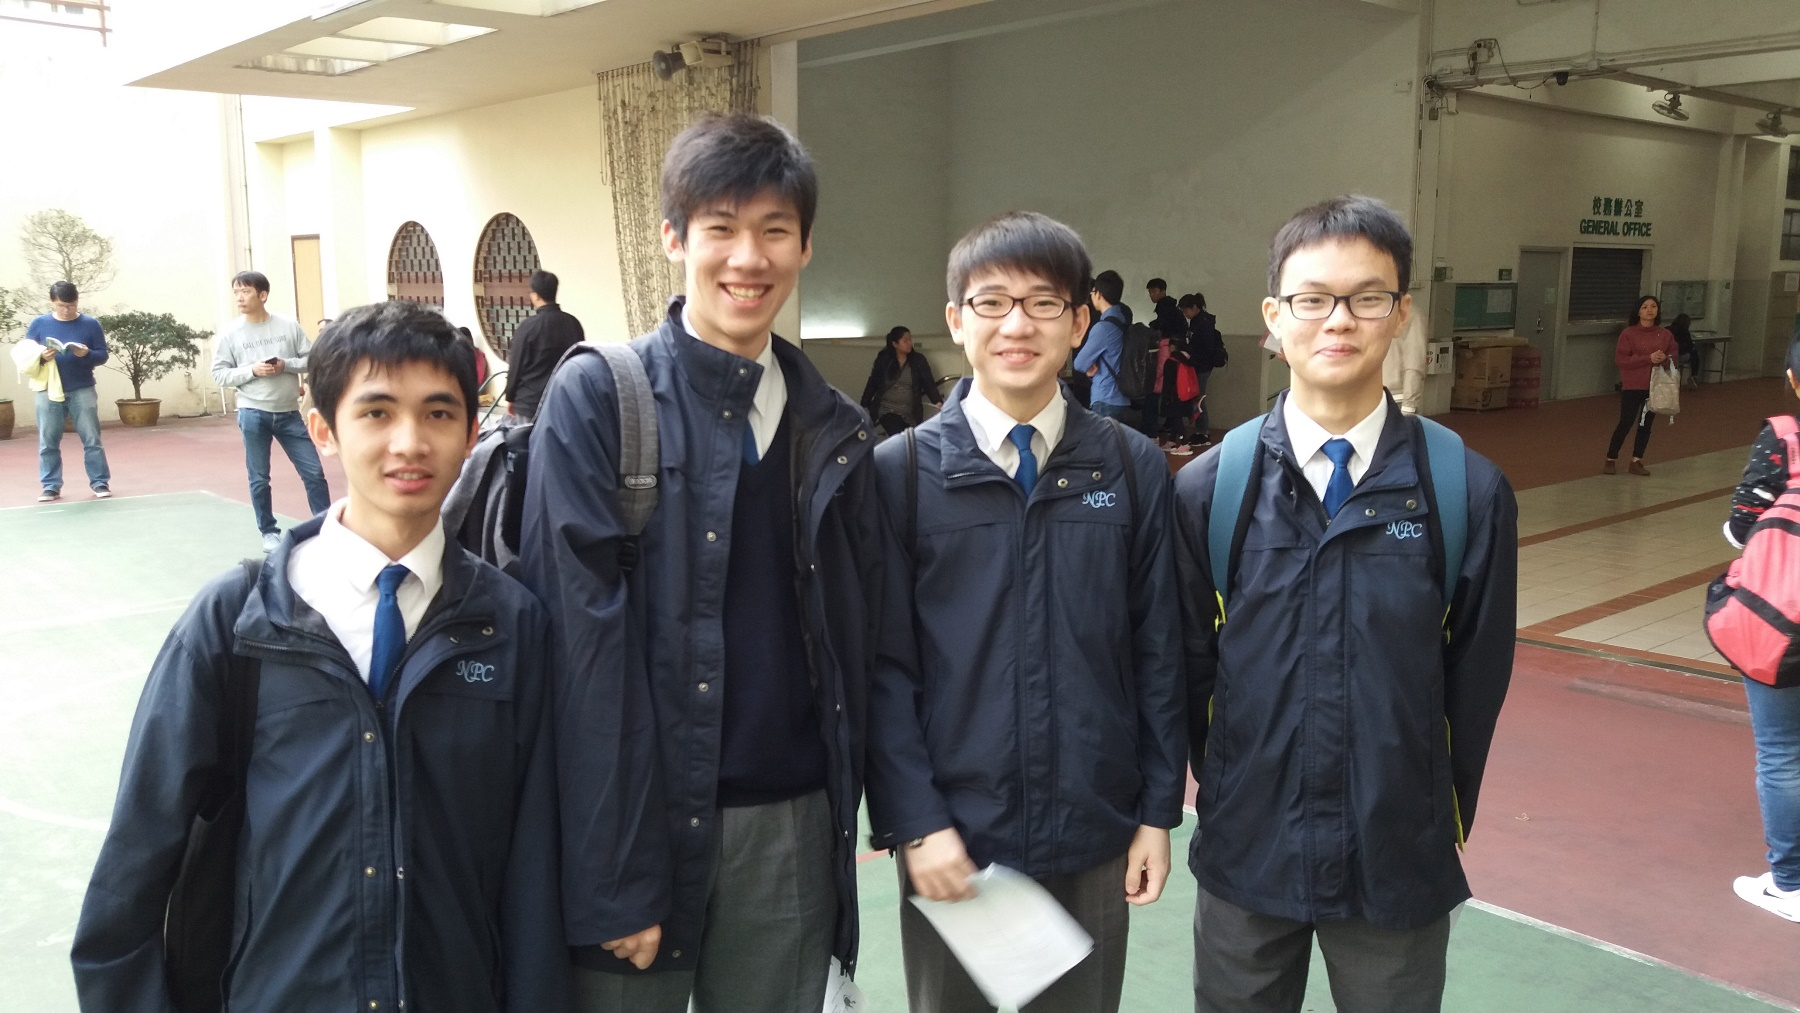 http://npc.edu.hk/sites/default/files/20181216_2.jpg